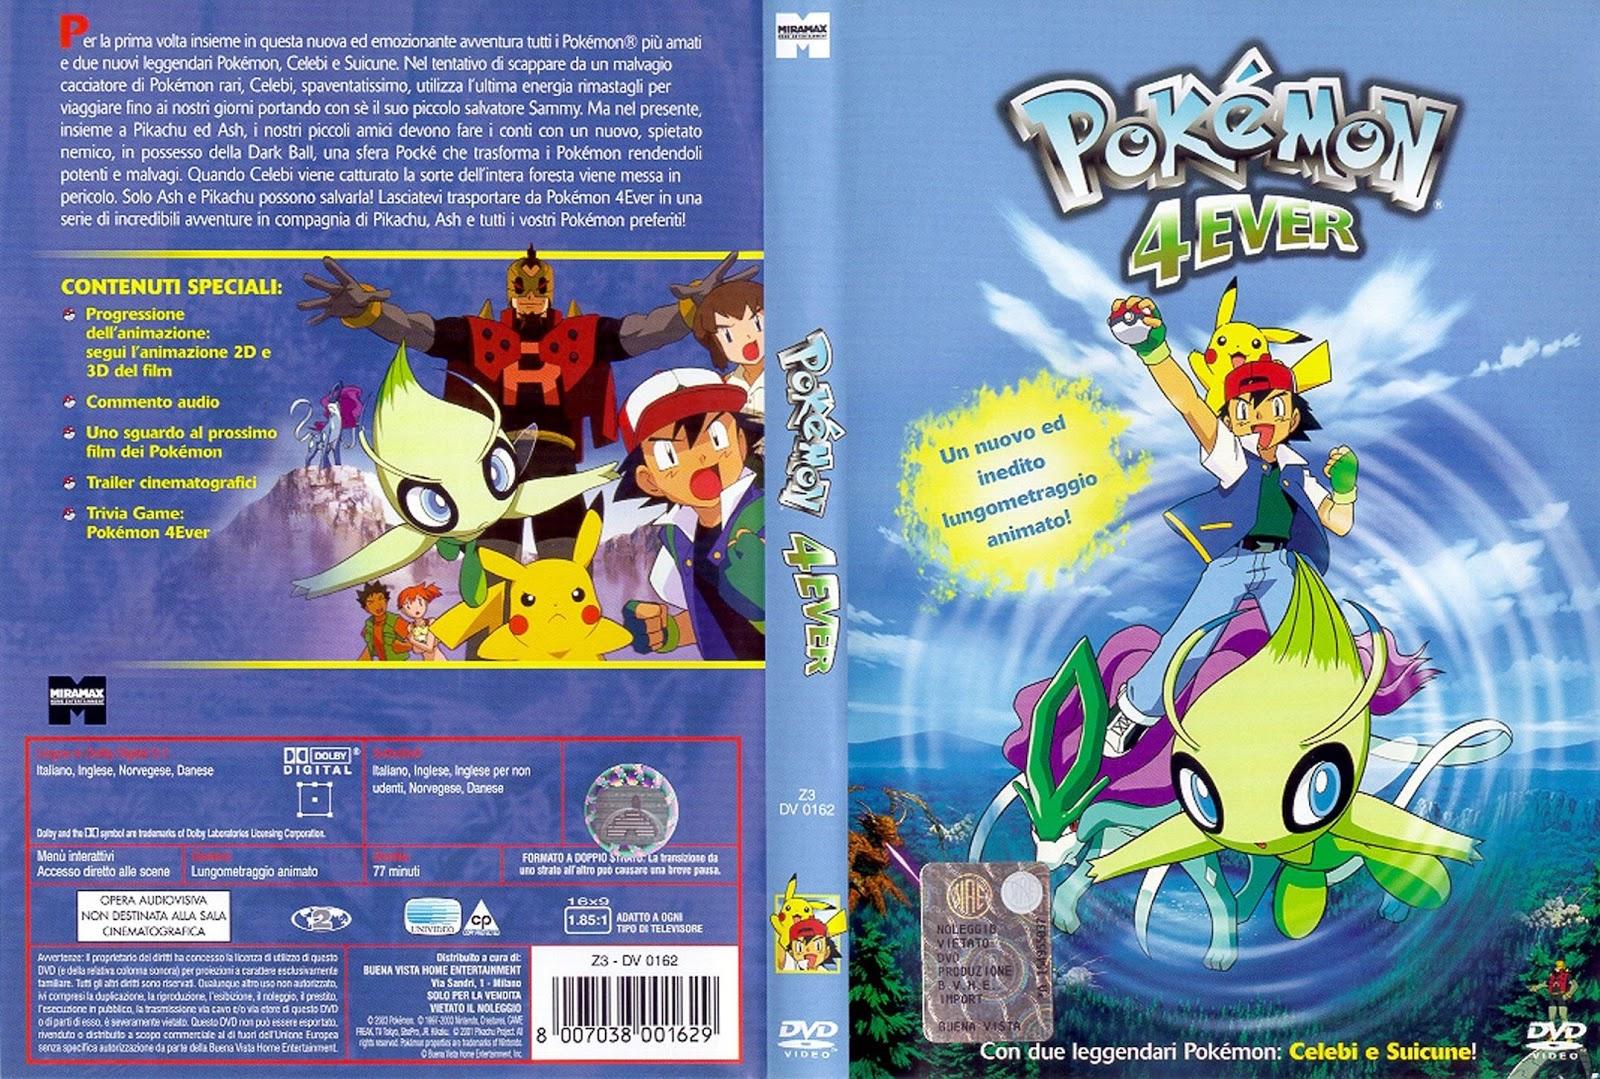 Pokemon_4ever - [DD] Pokémon Película 4 Pokémon Por Siempre: Celebi, La Voz del Bosque - Anime Ligero [Descargas]